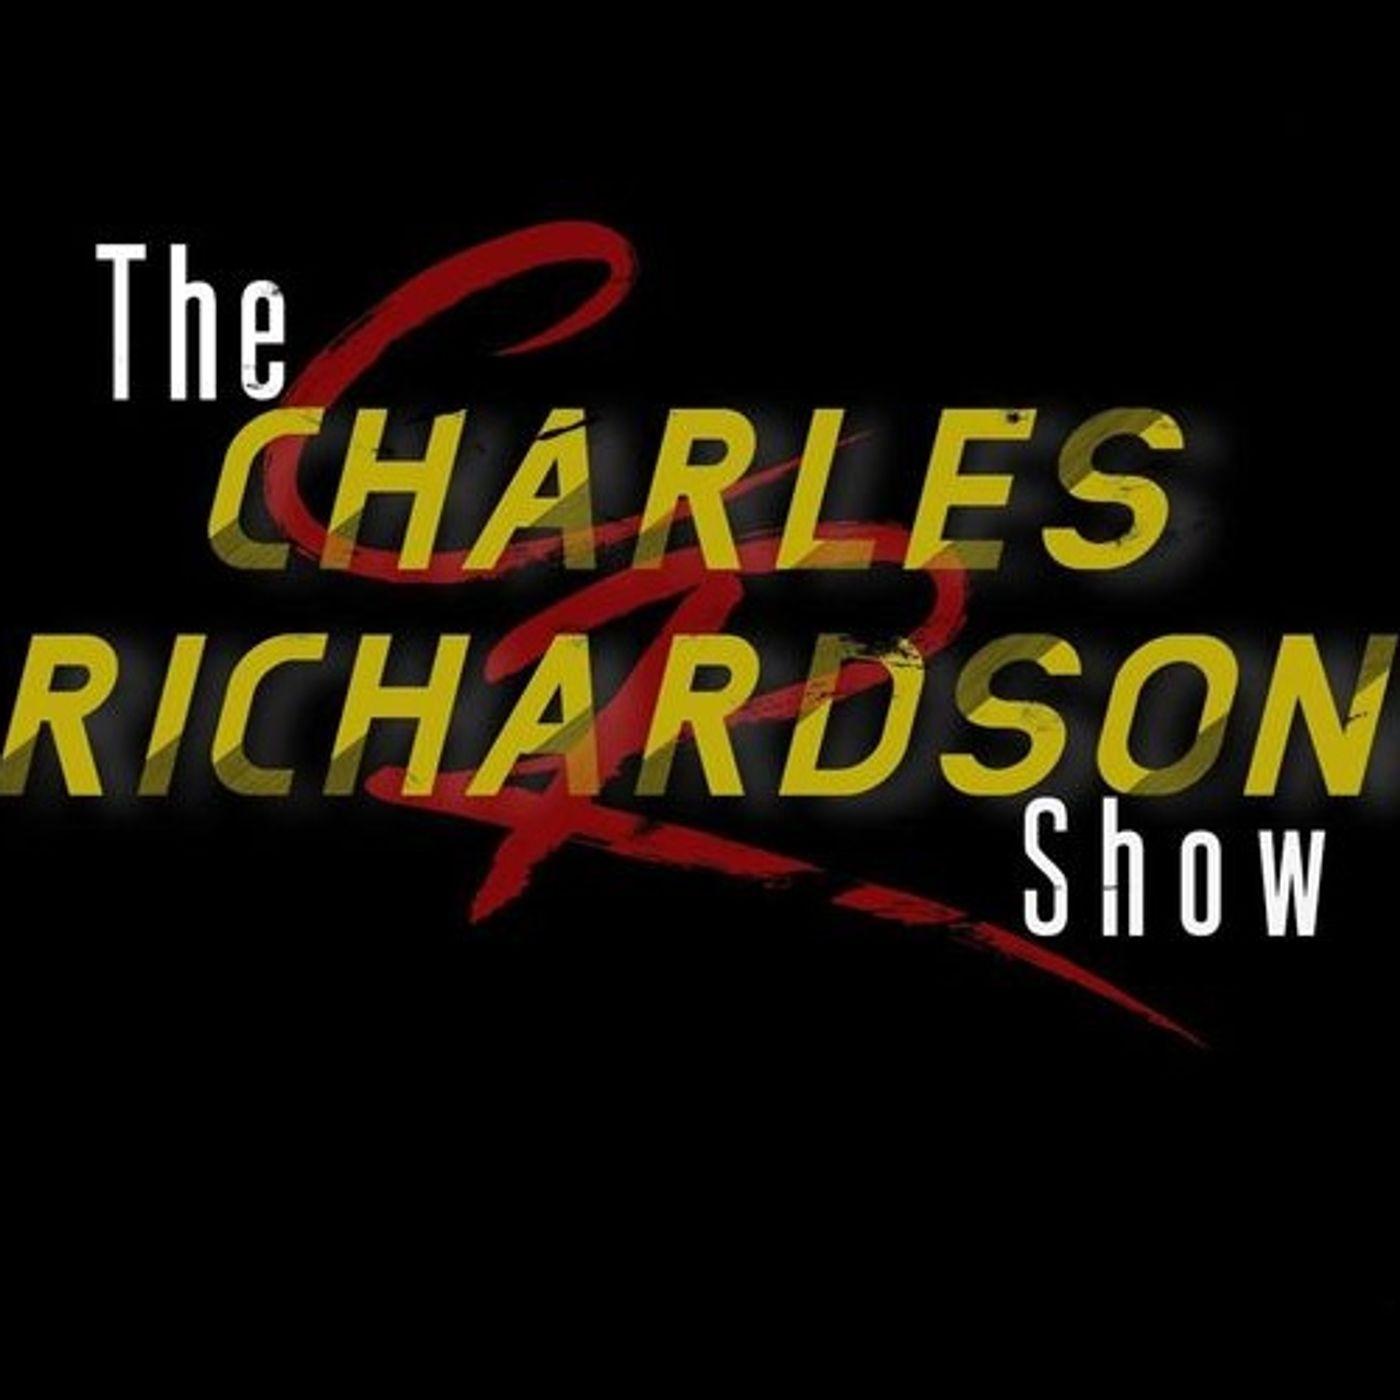 The Charles Richardson Show